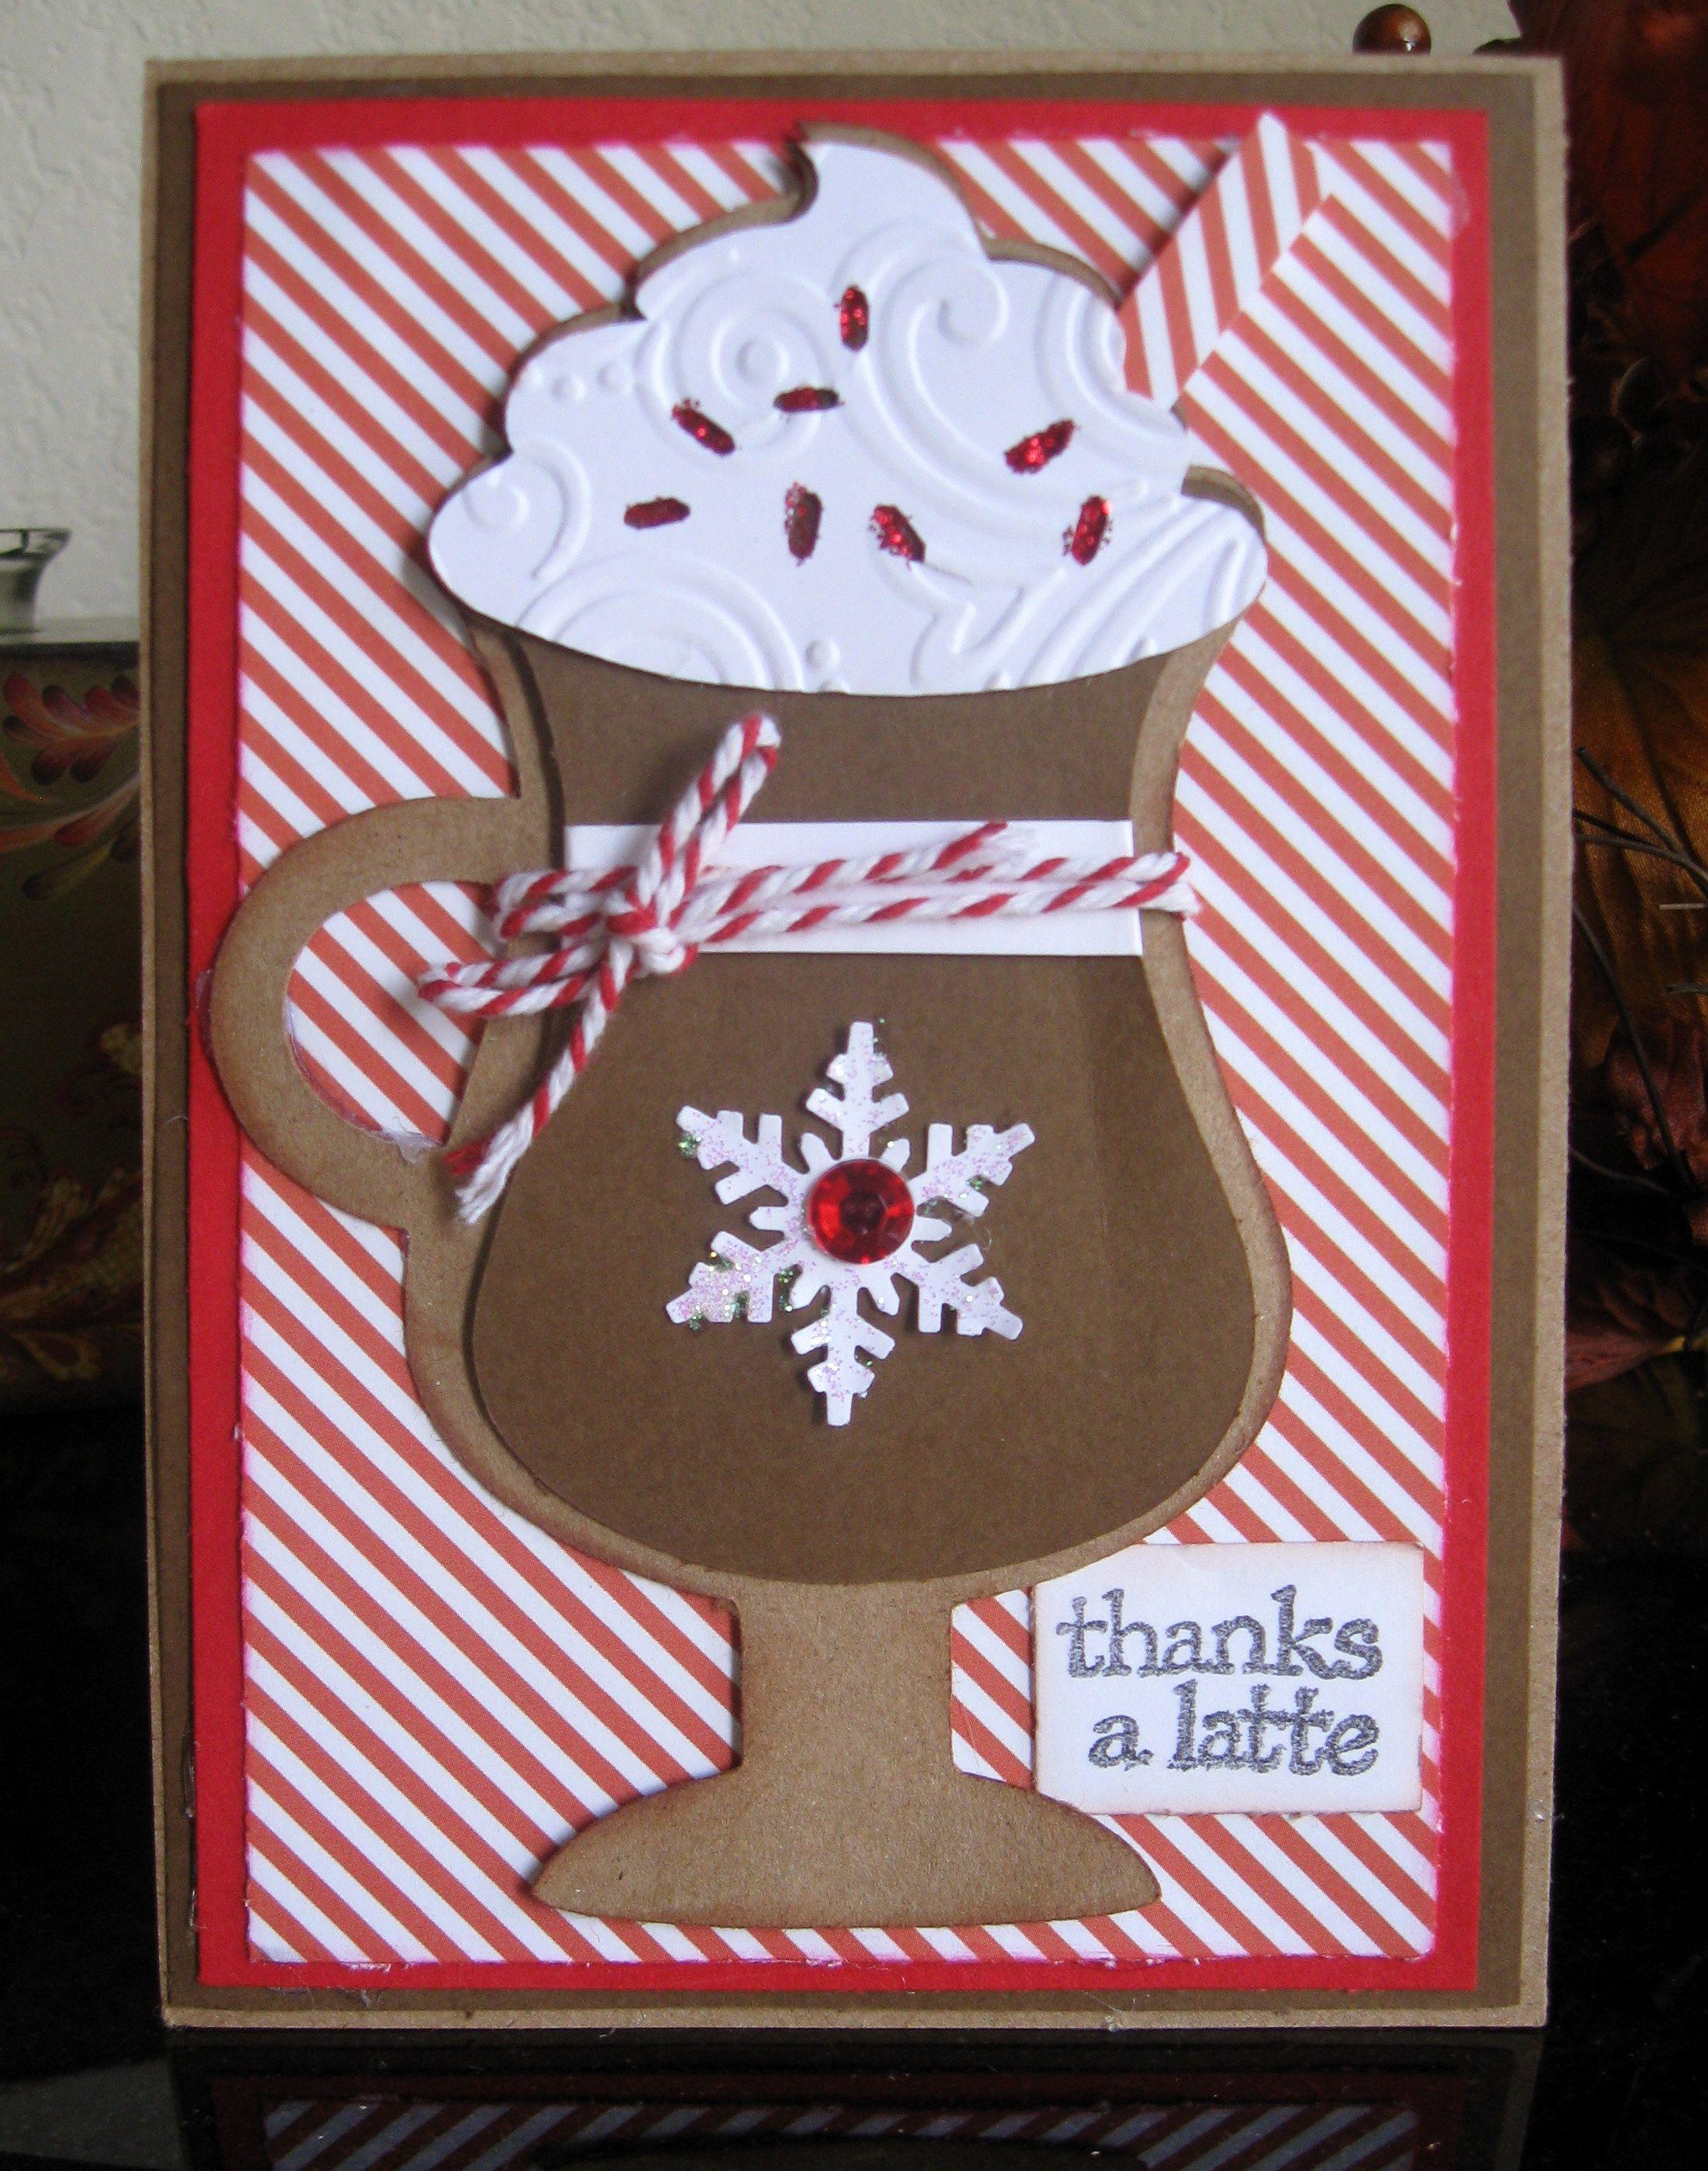 Thanks A Latte  ScrapbookCom  Love The Embossed Whip Cream On